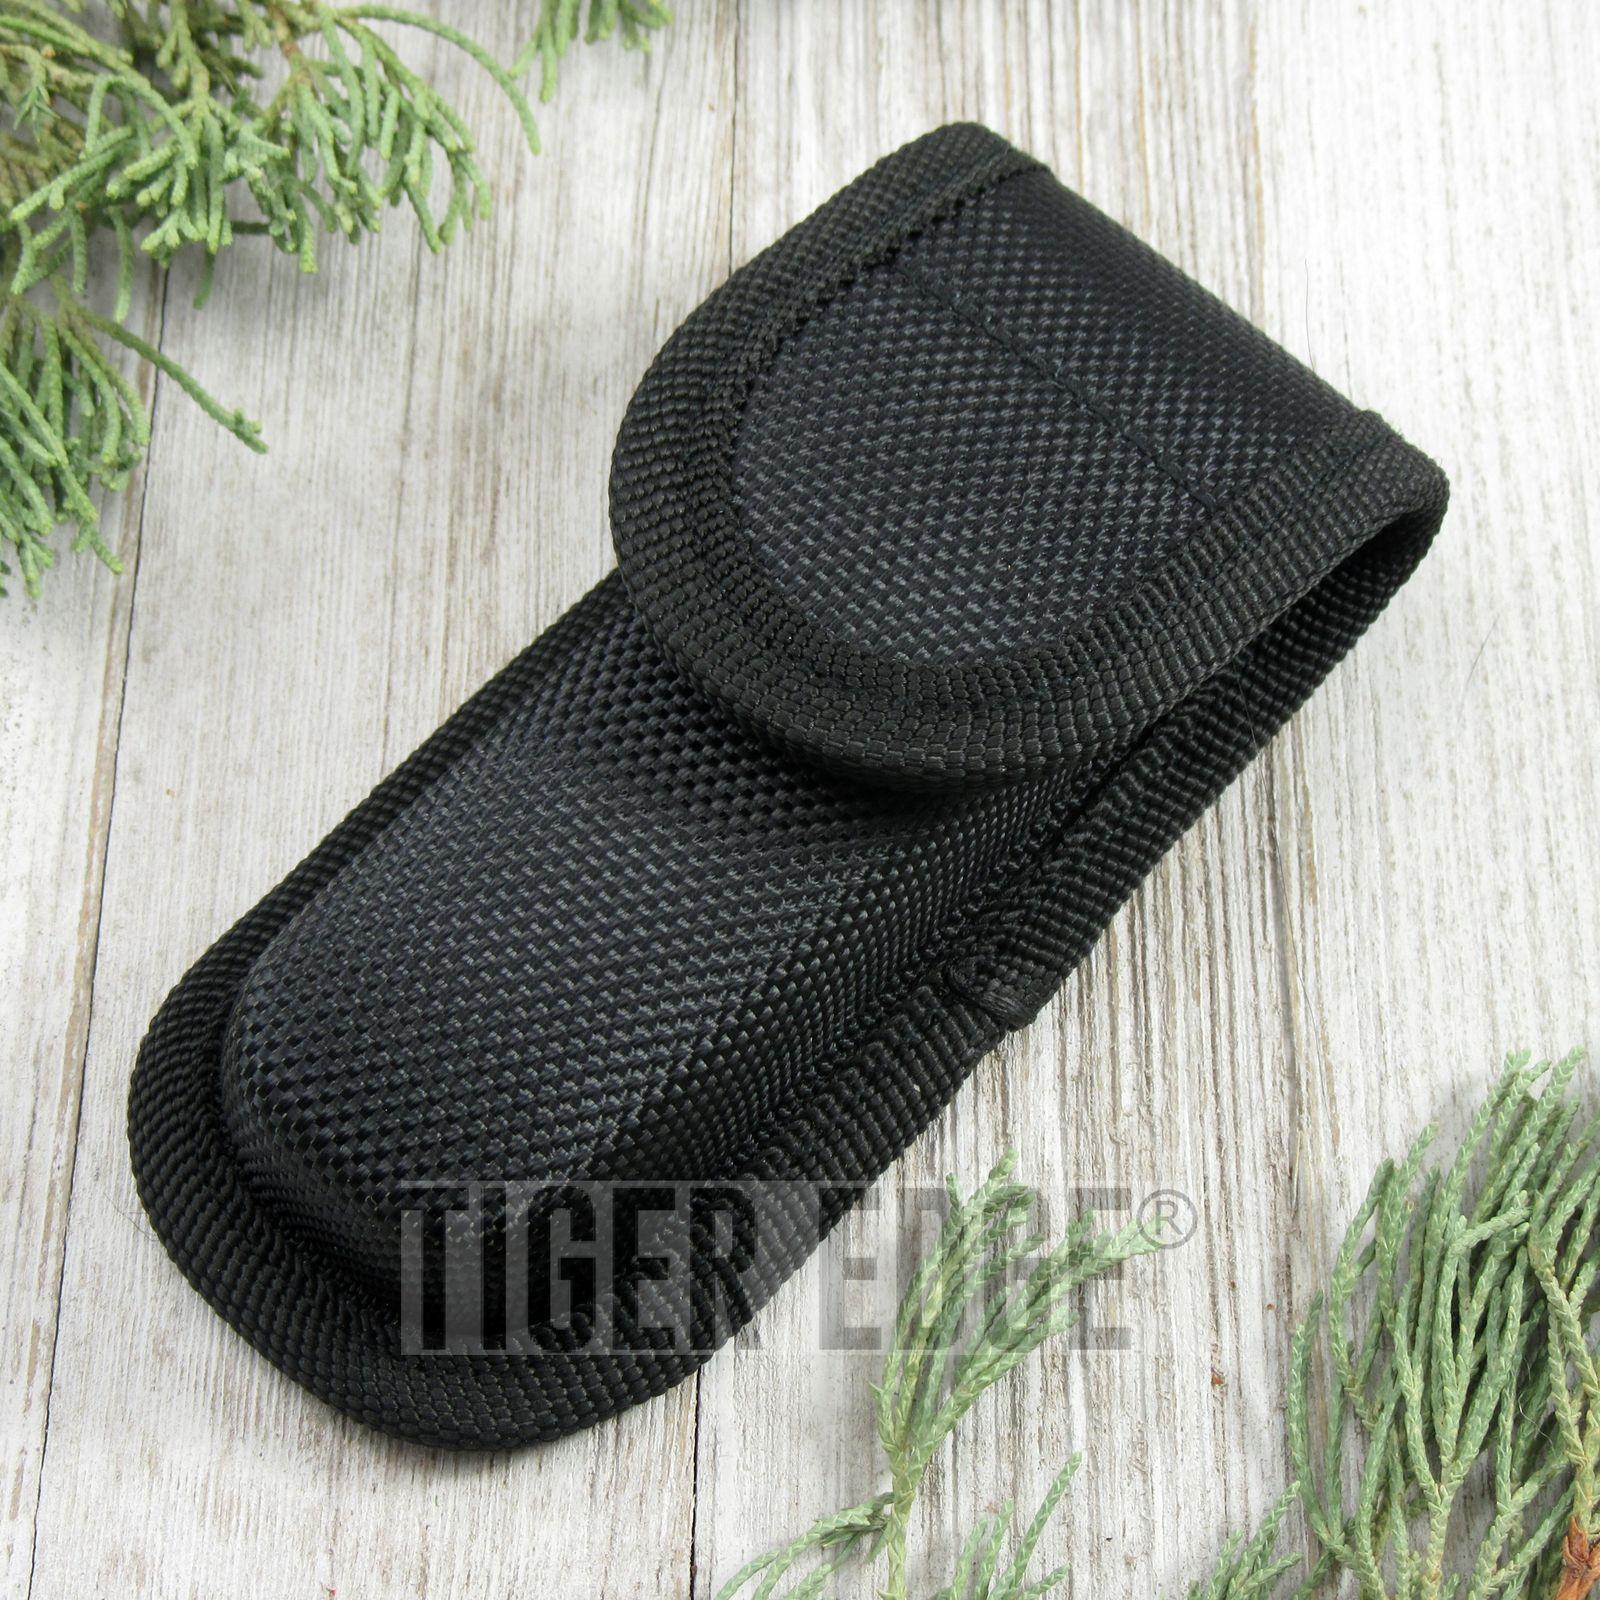 Folding Knife Sheath Hard Molded Tactical Black Nylon Case Pouch - Fits 4